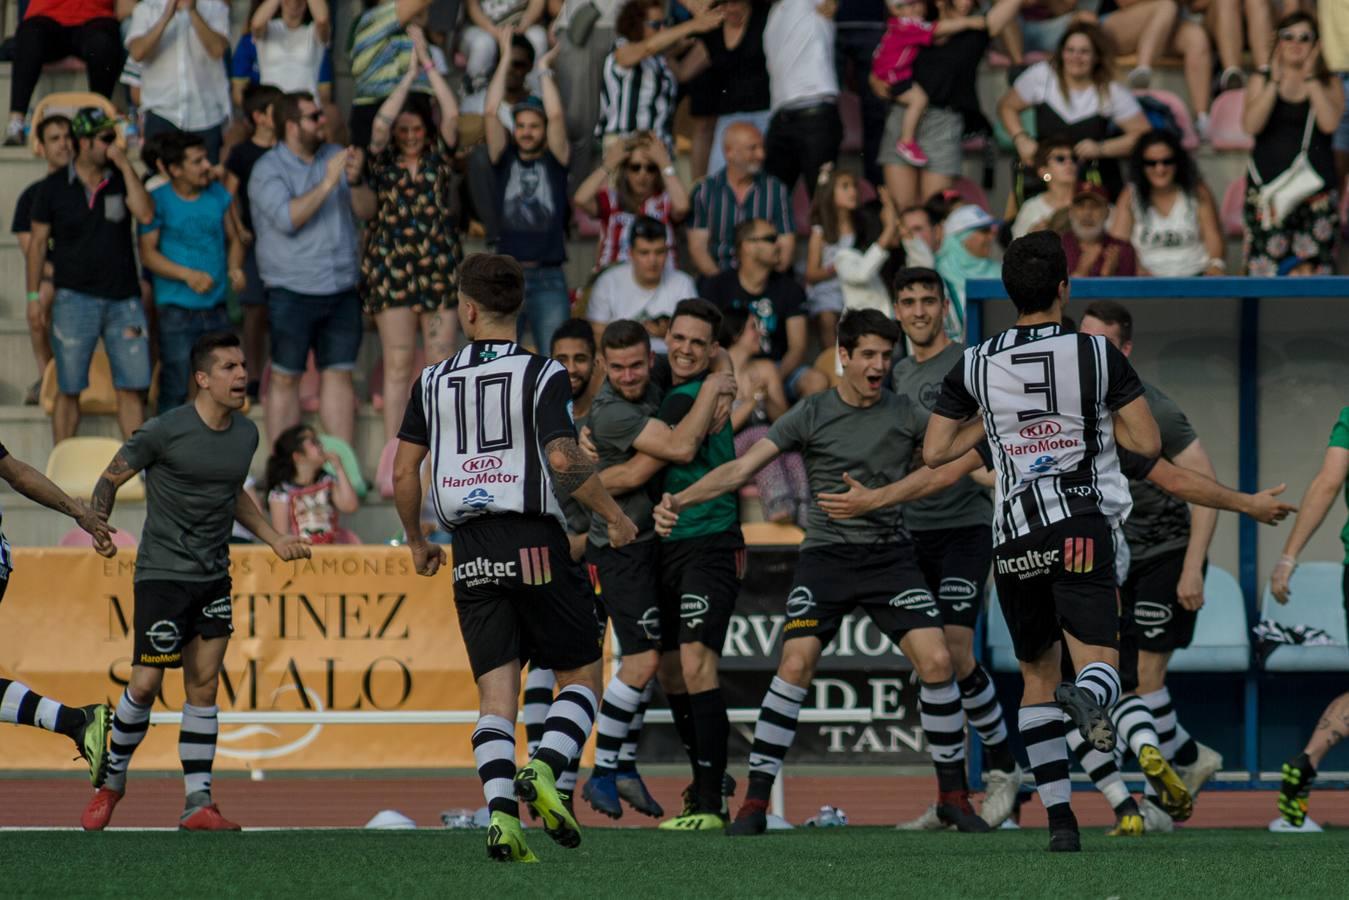 El gol del Haro-Zamora: en propia puerta para el ascenso